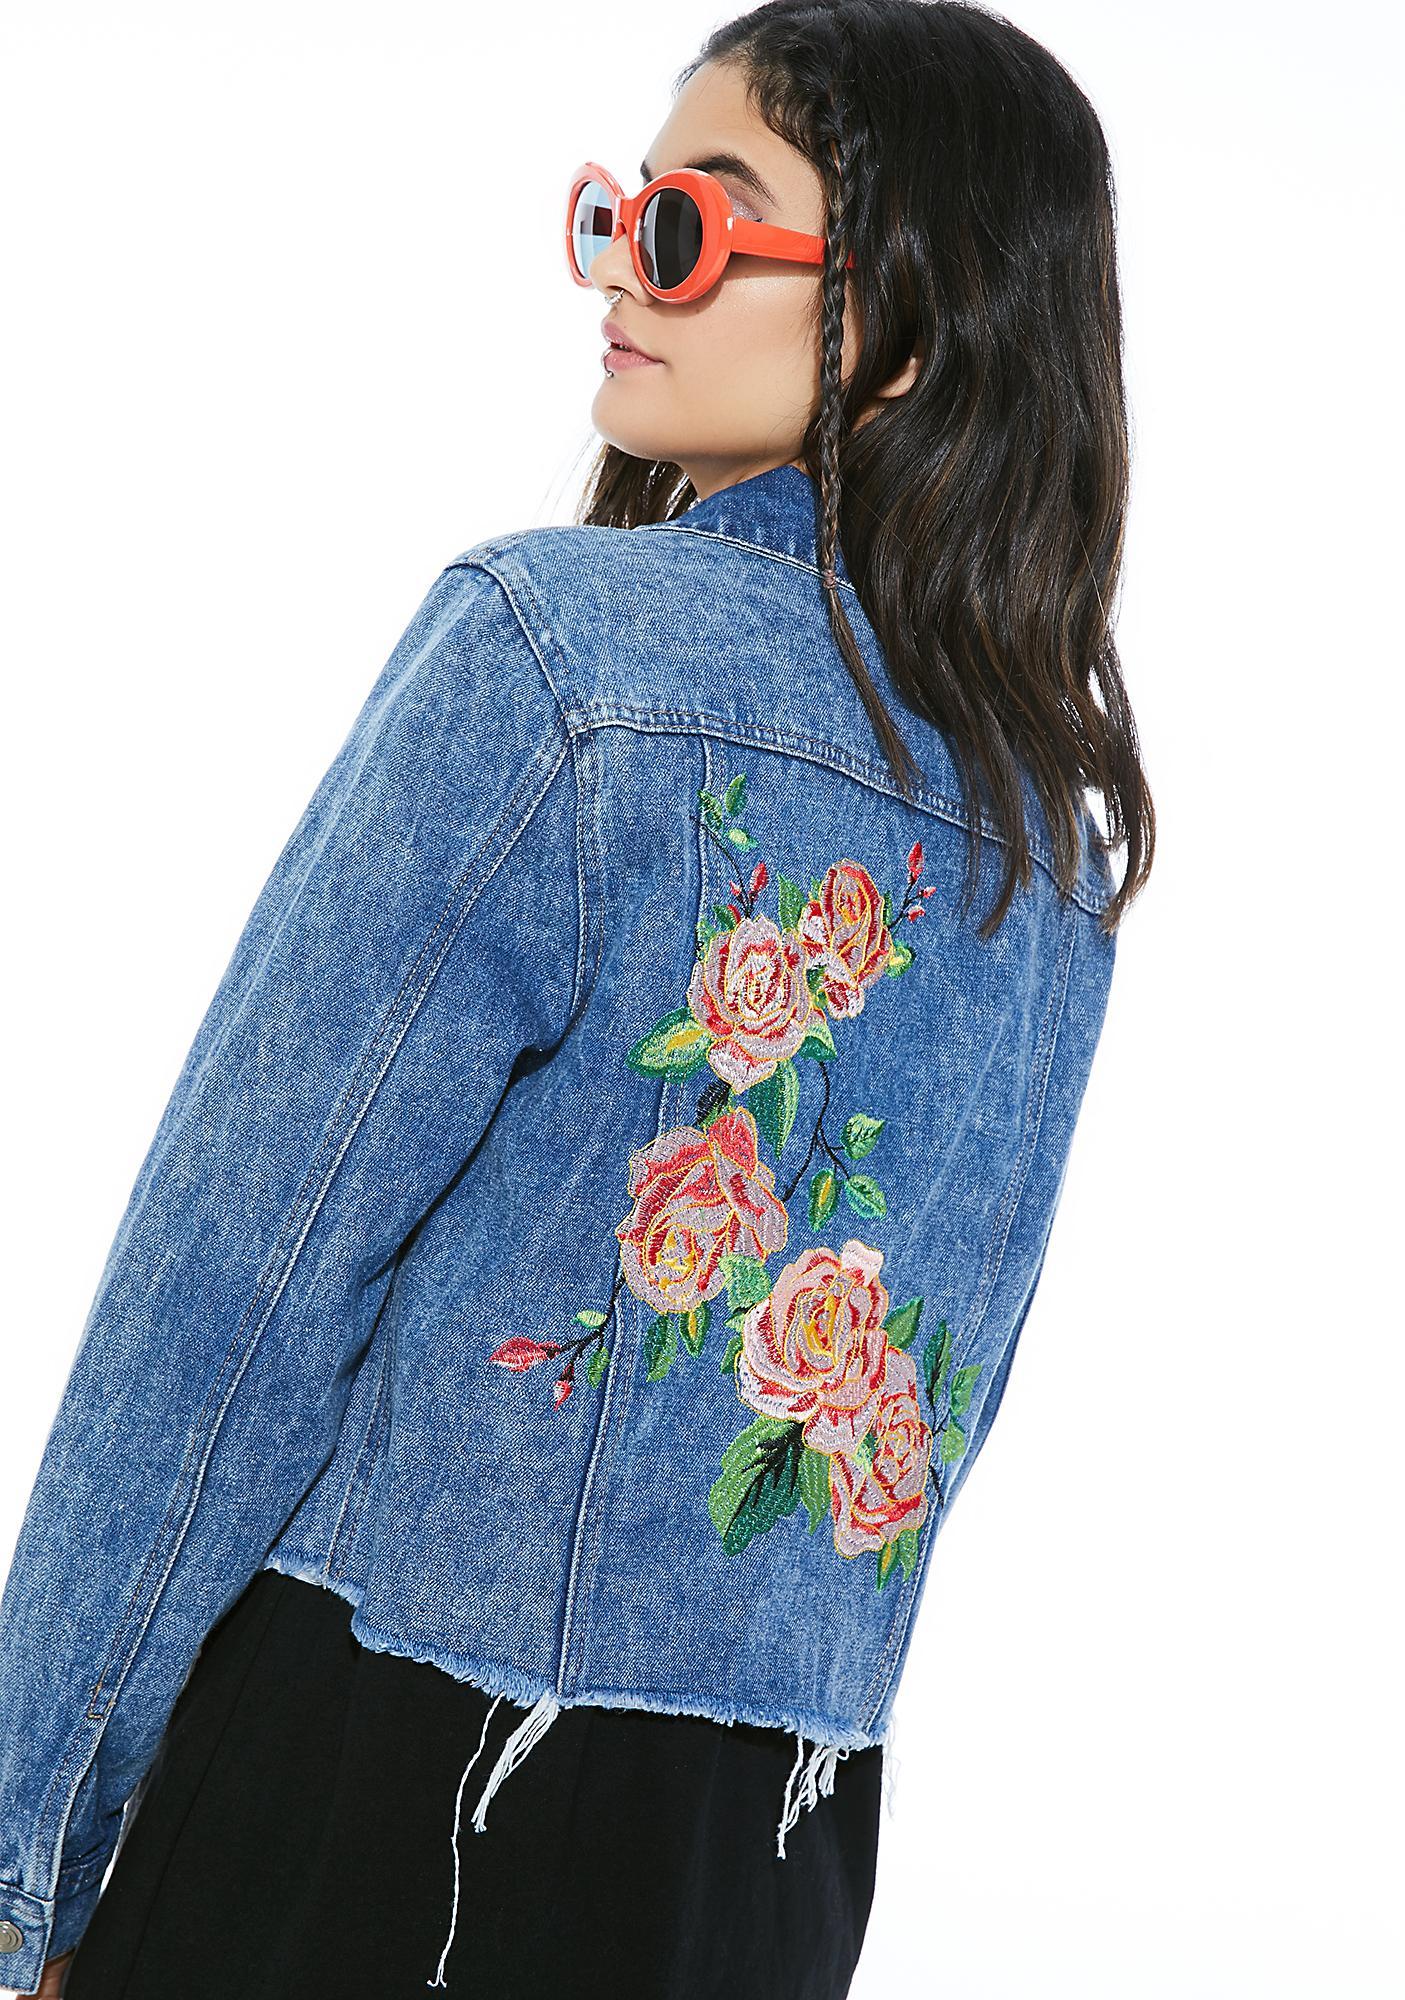 Sweet Sorrow Denim Jacket